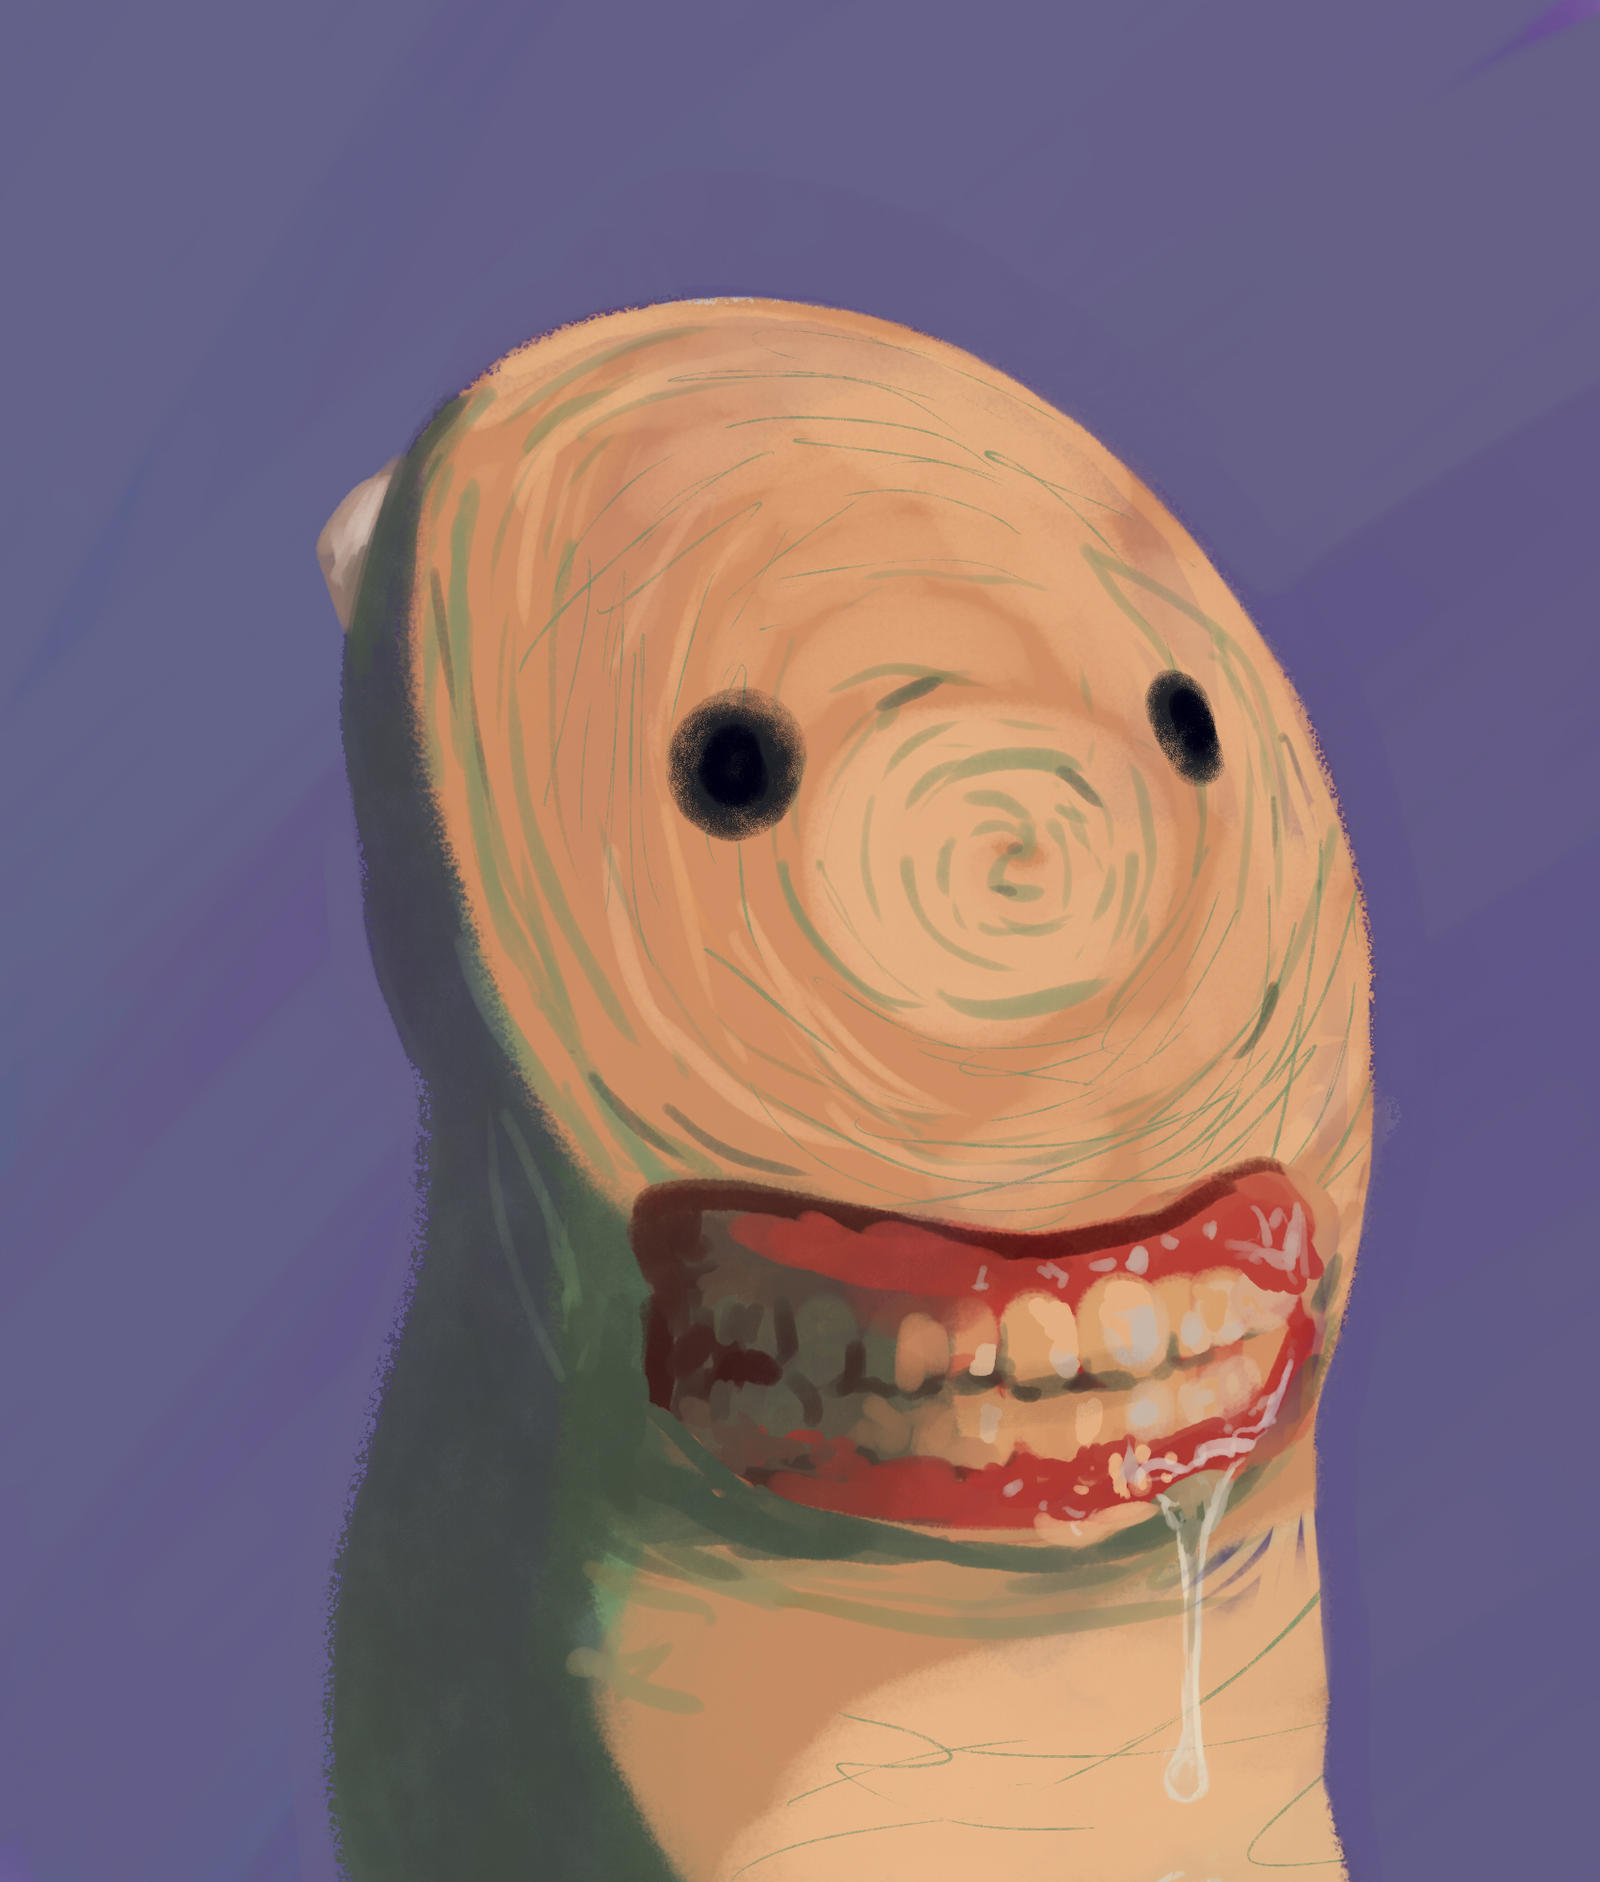 Thumb teeth by octomanz